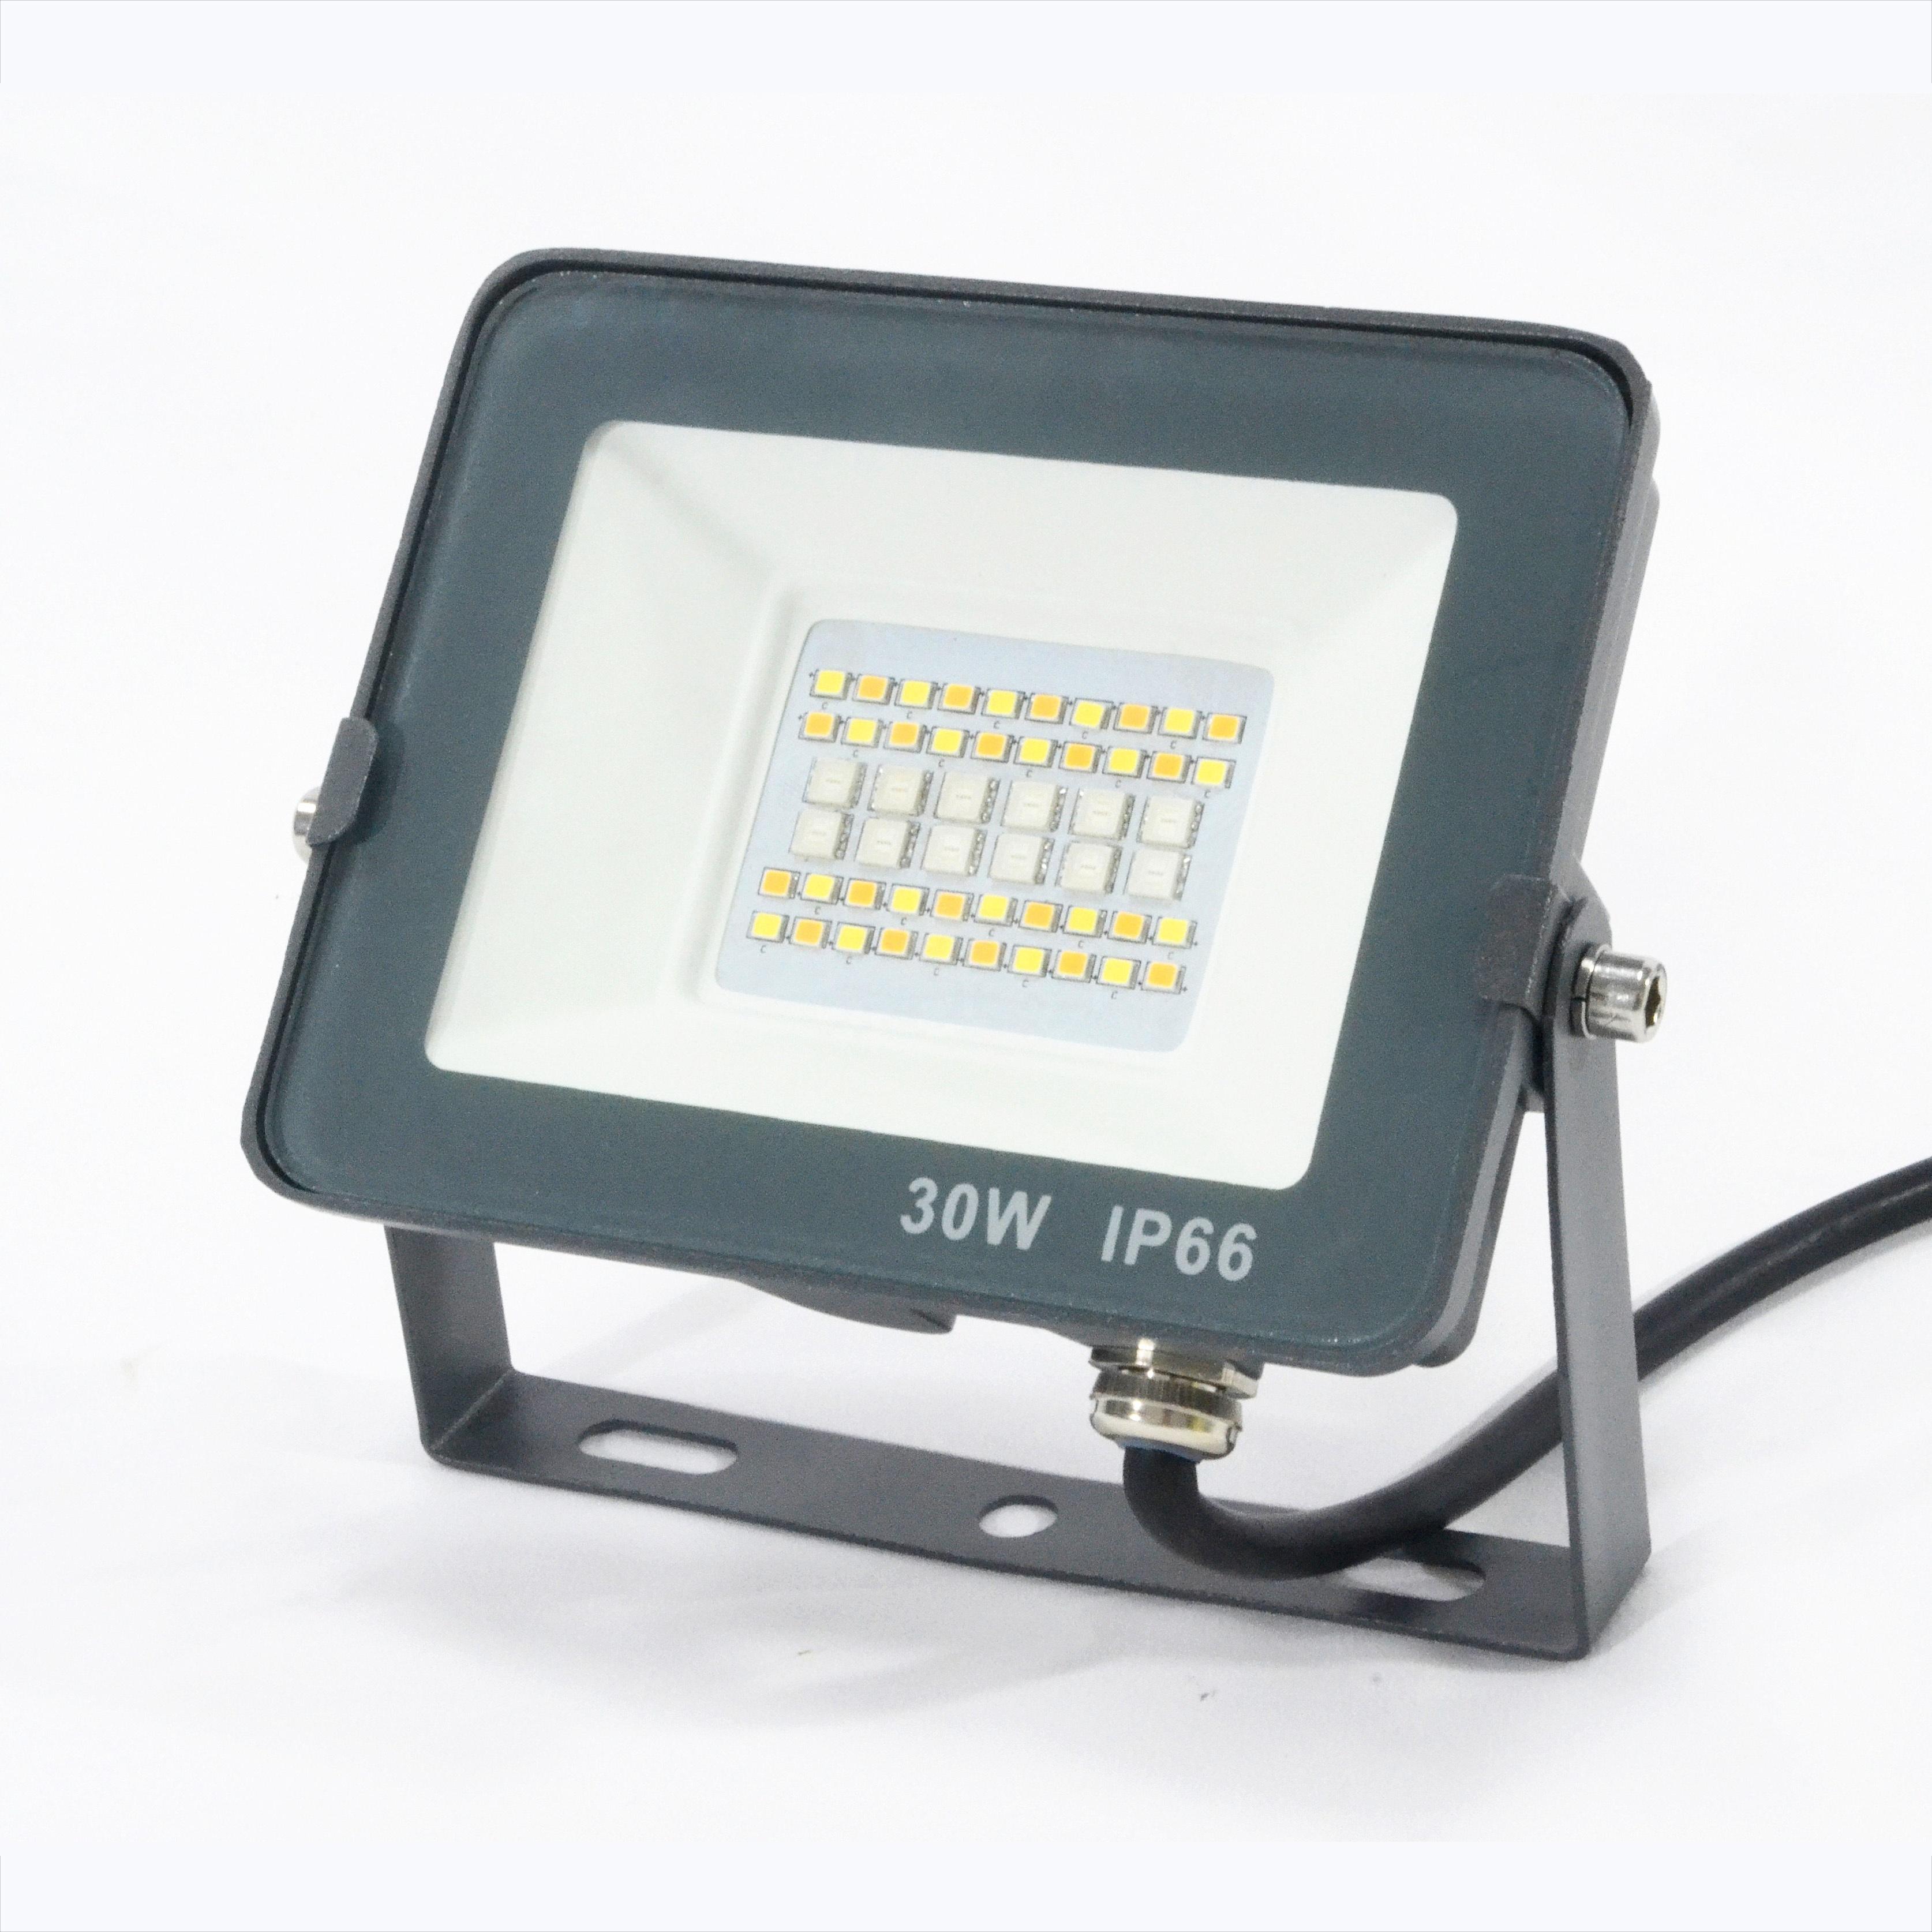 Unique Design Voice Smart Controlled Ultra Slim 30 Watt Projector Phone Panel Ktv Rgb Led Flood Light Kit